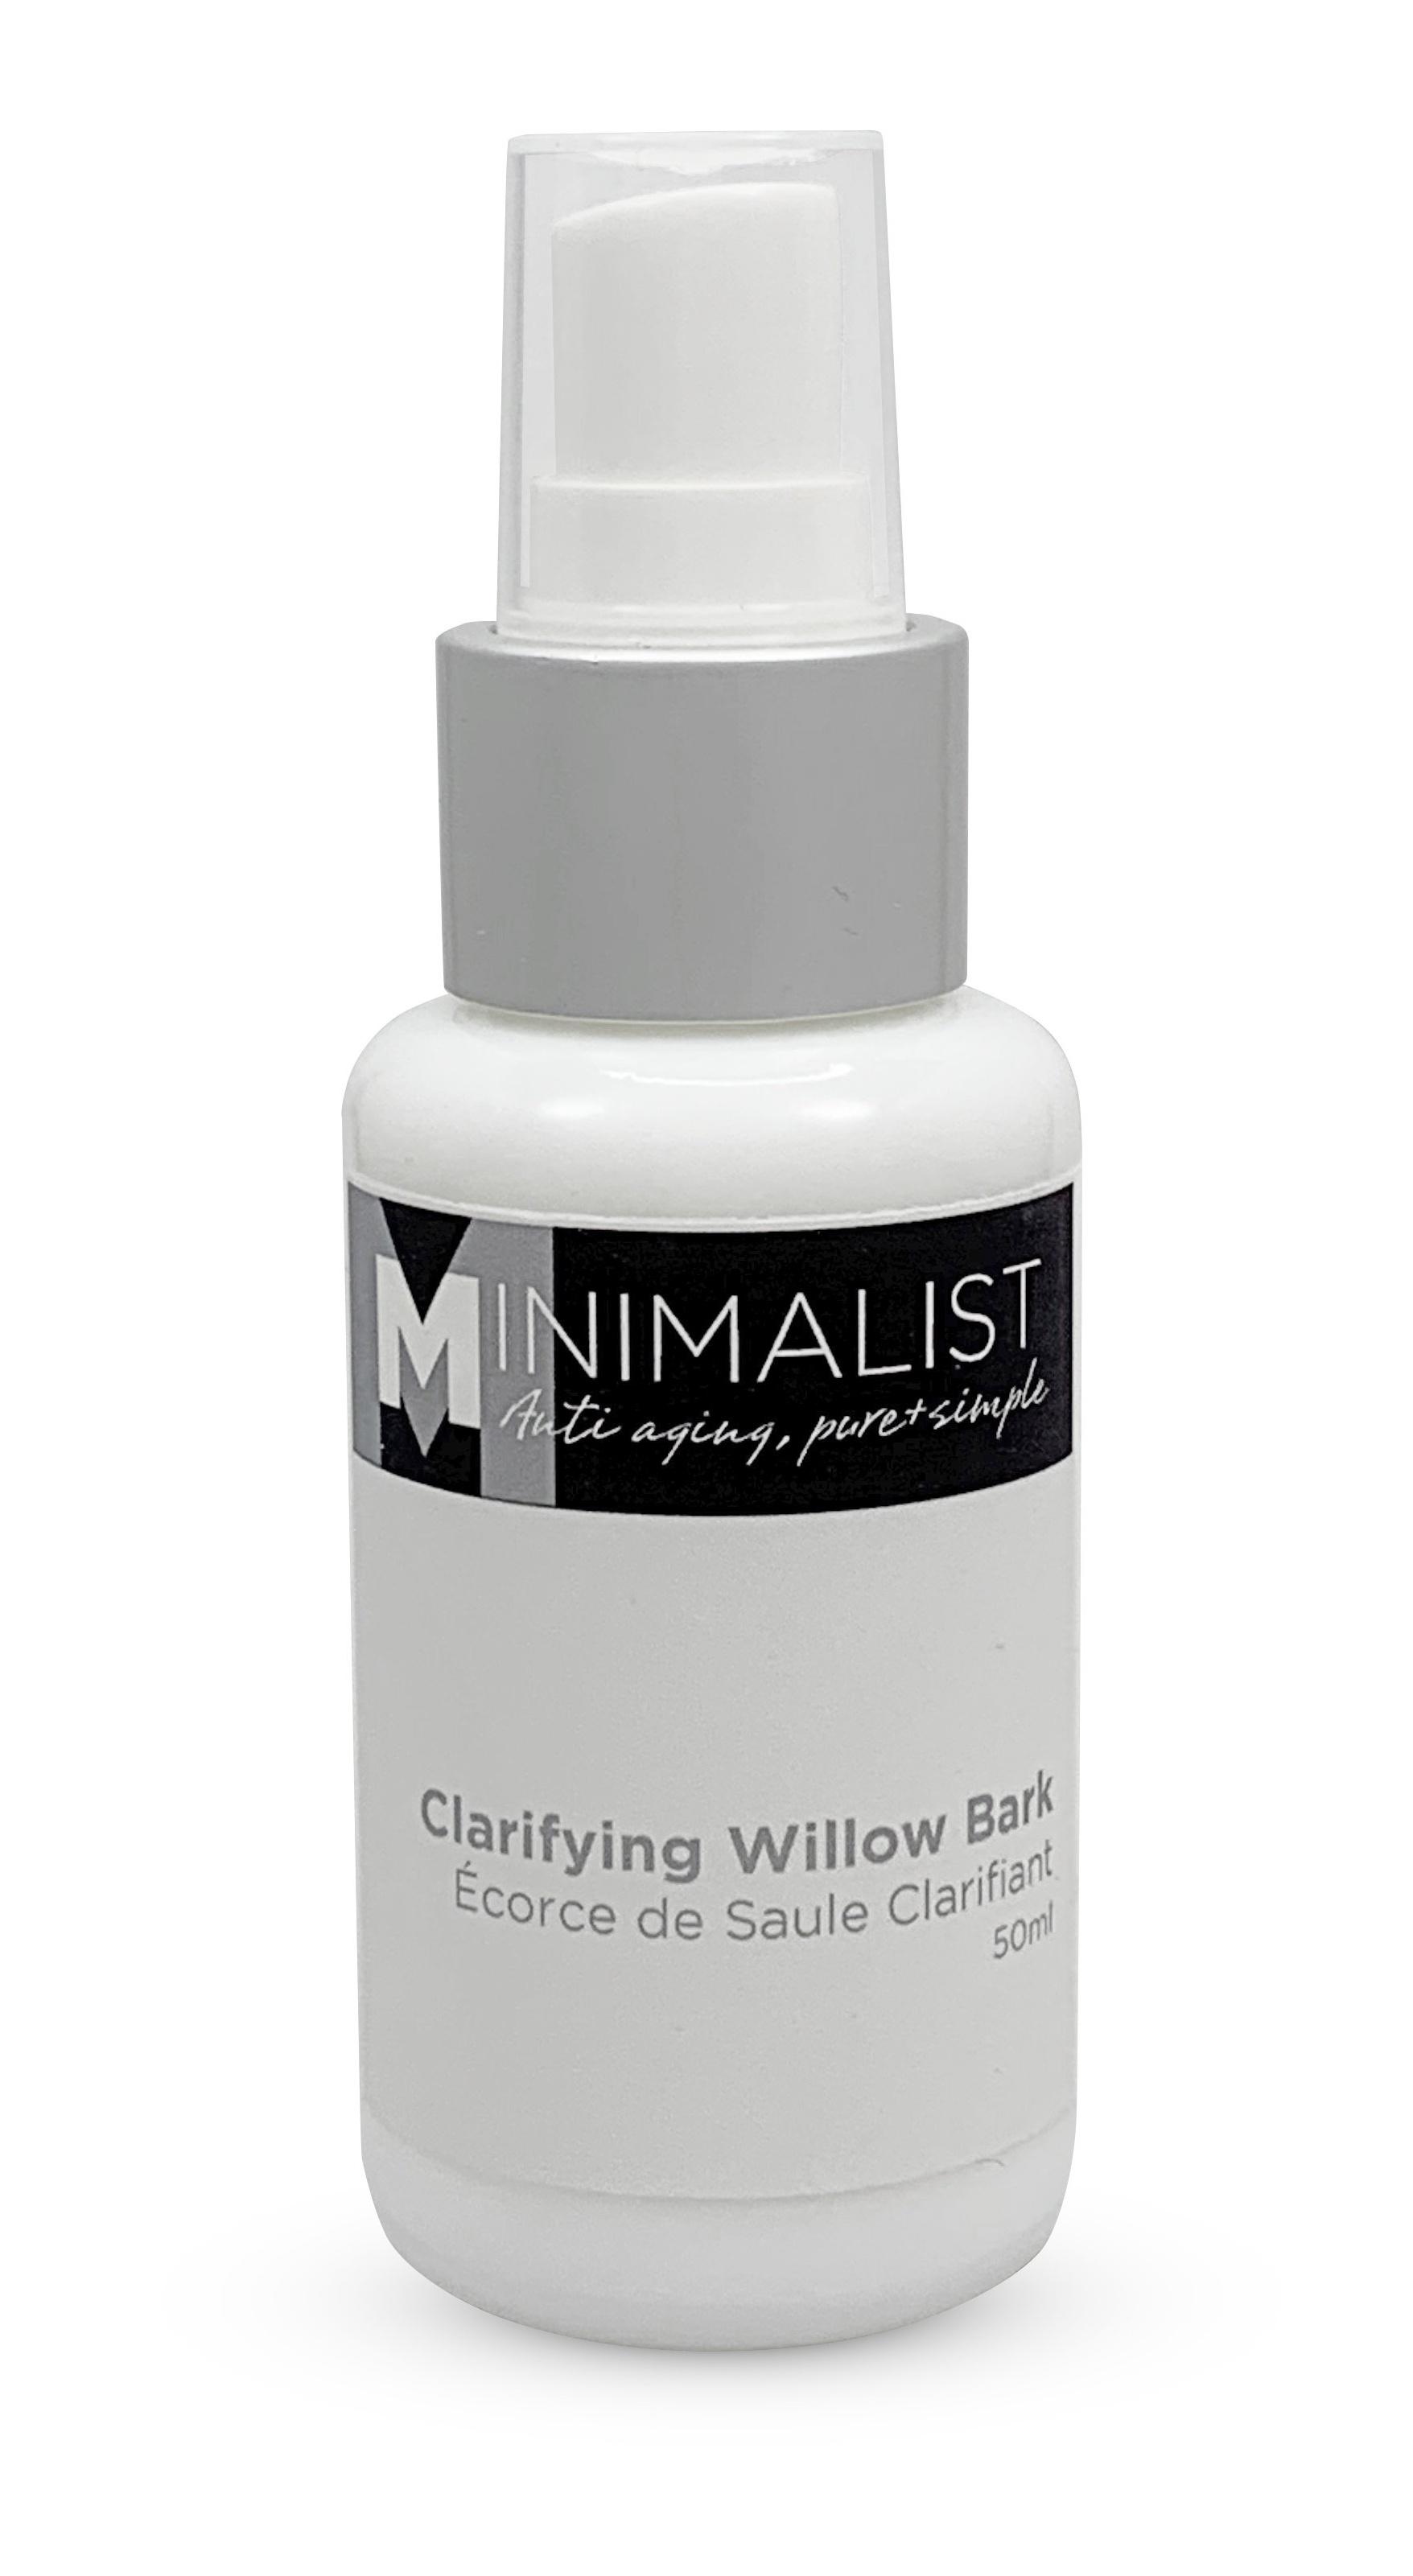 minimalist Clarifying Willow Bark